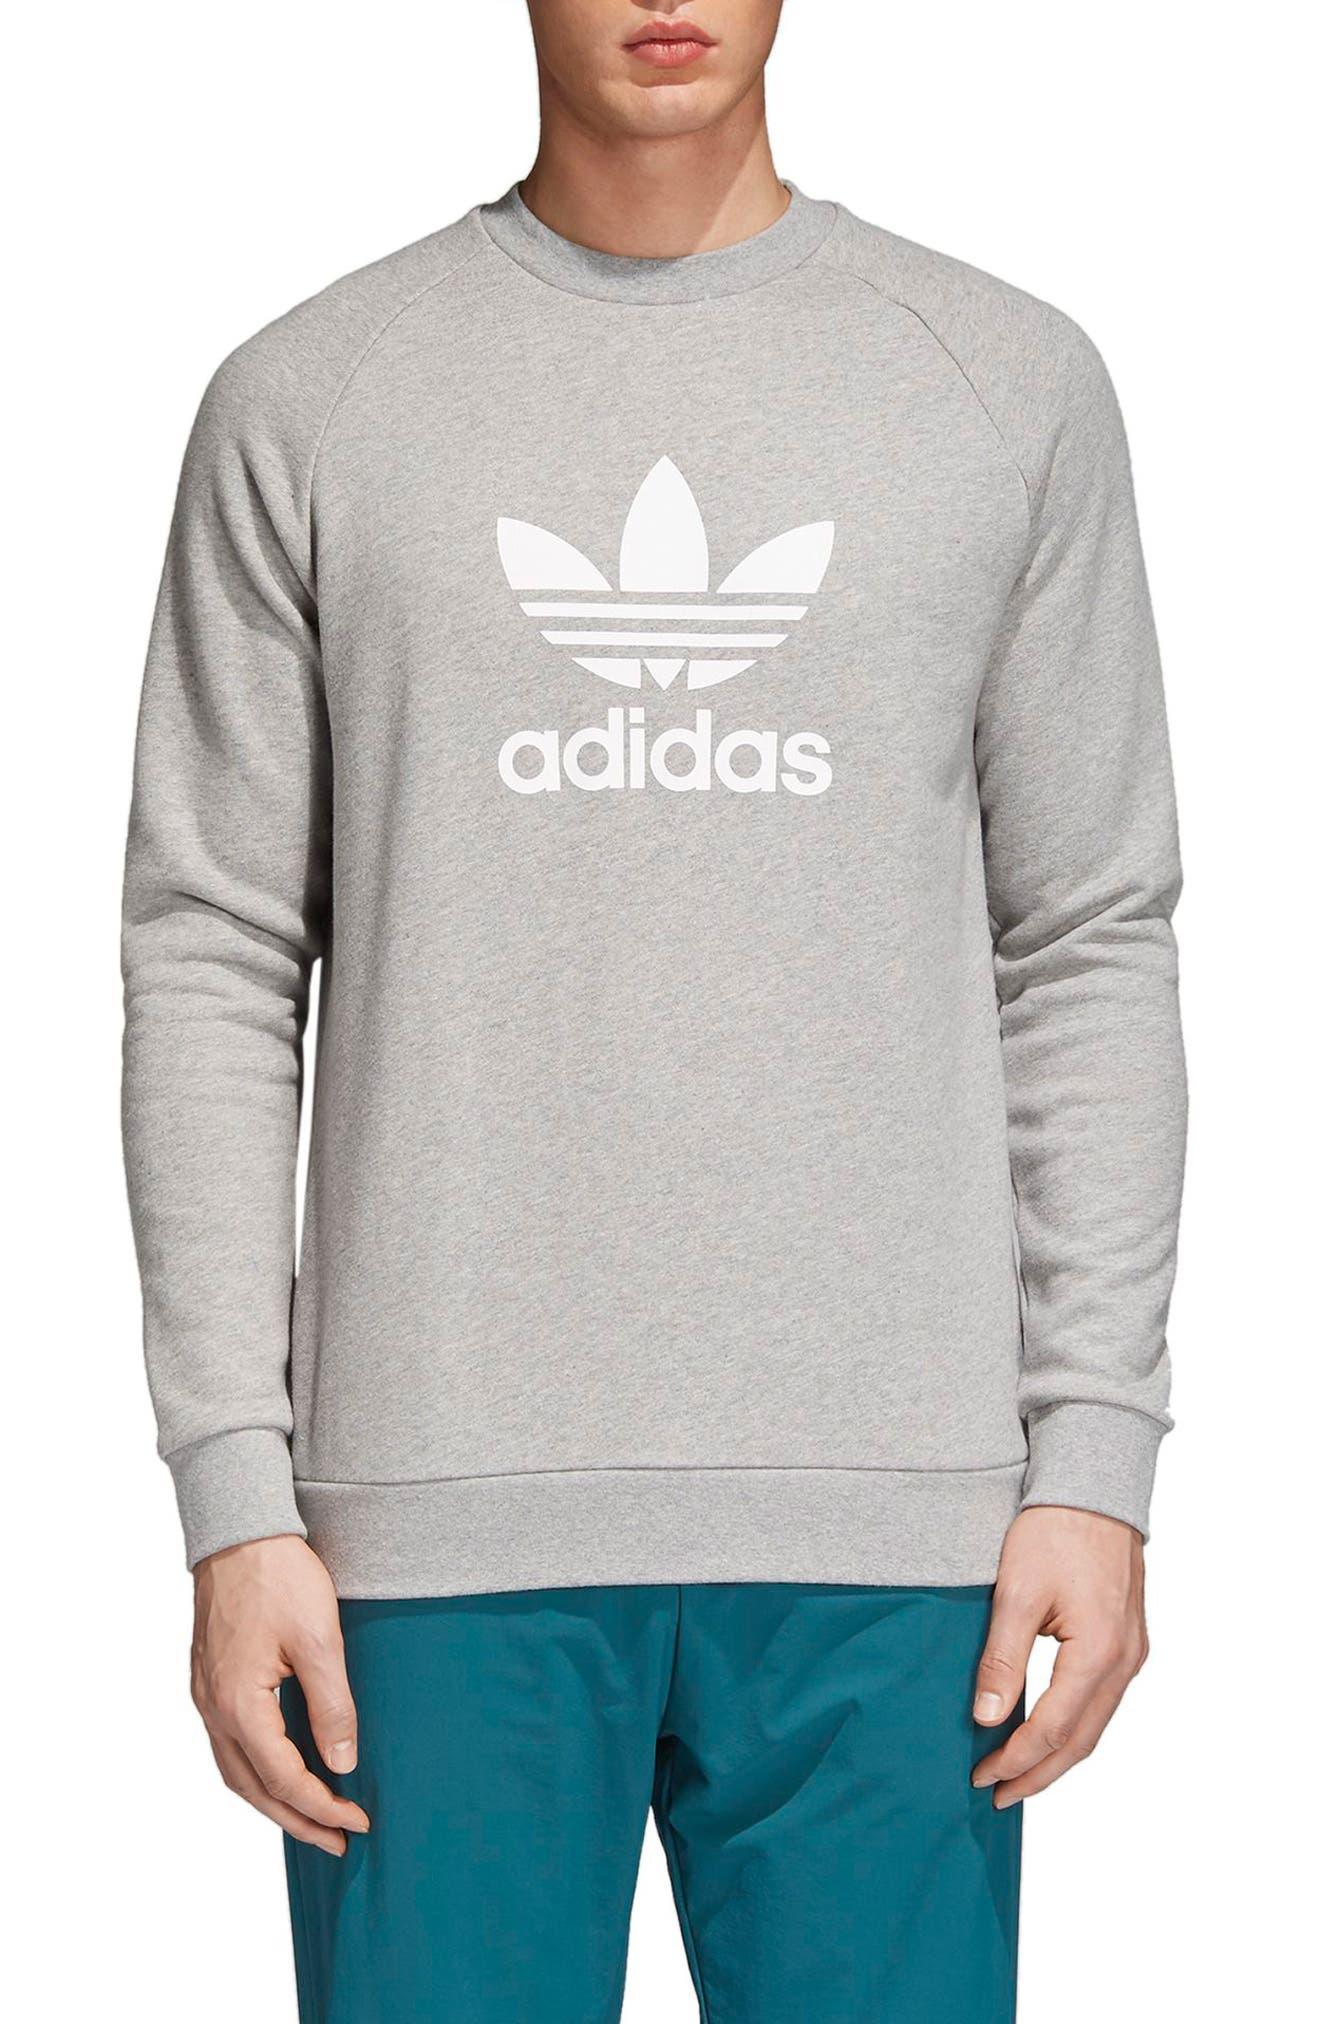 adidas Trefoil Crewneck Sweatshirt,                             Main thumbnail 1, color,